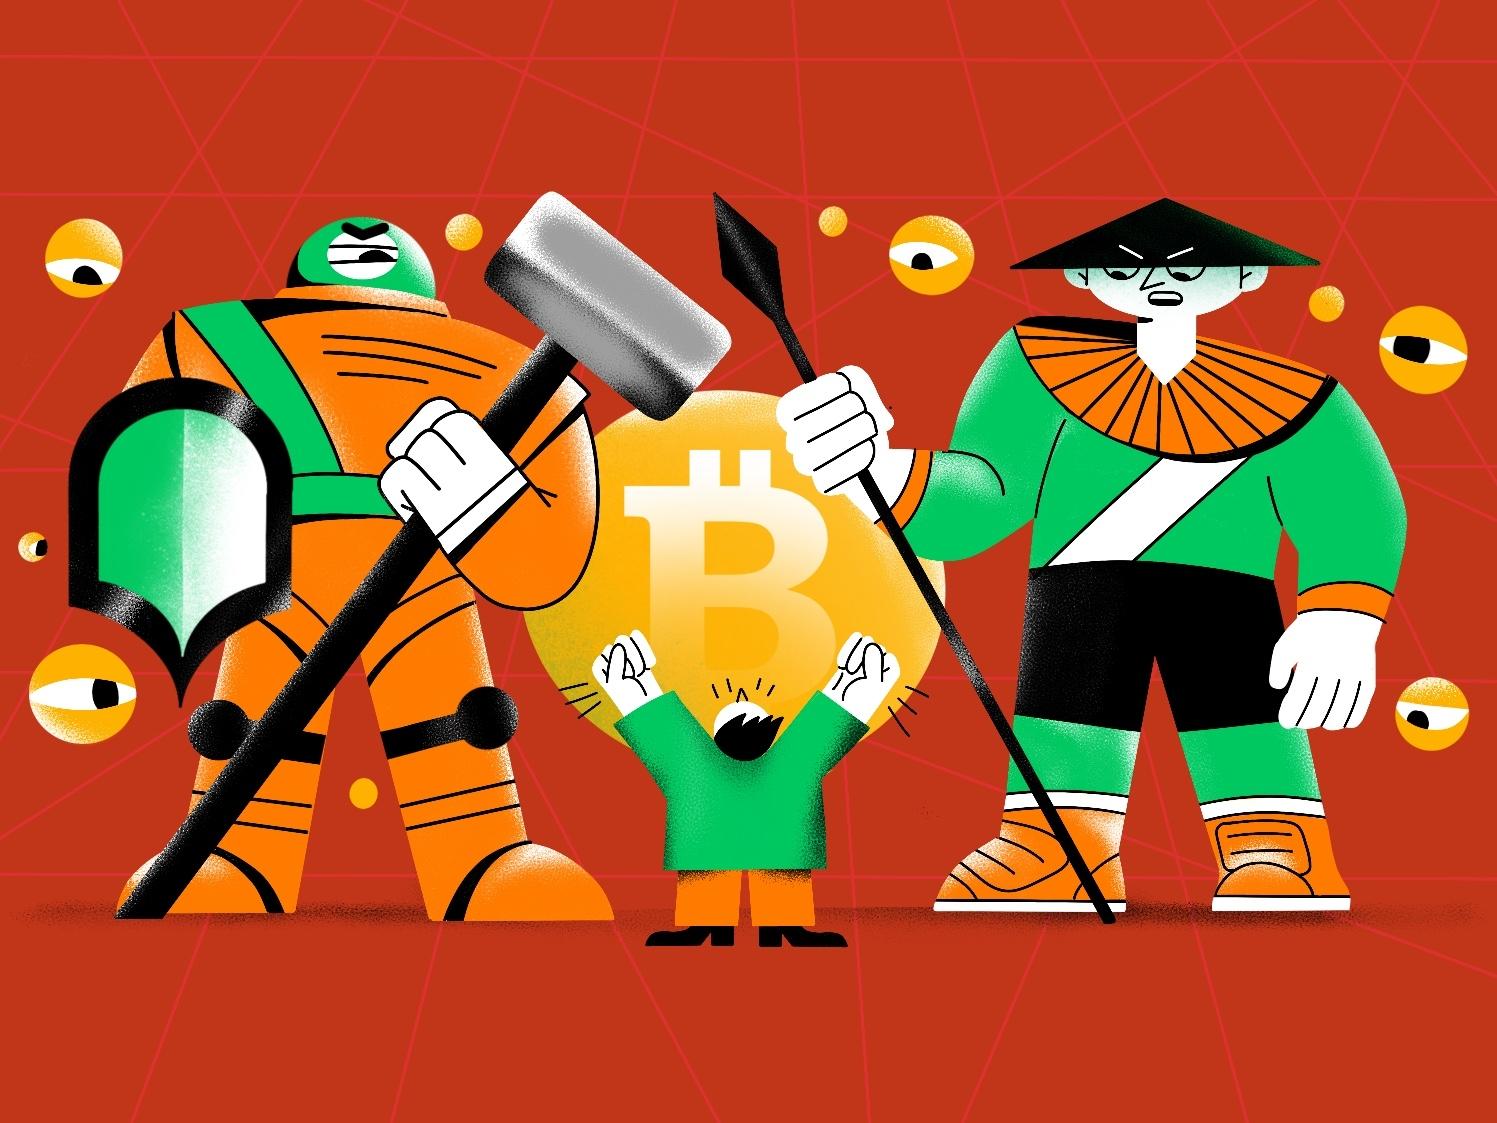 exchange blocks access illustration illustraion cryptocurrency crypto access bitcoin blockchain block exchange